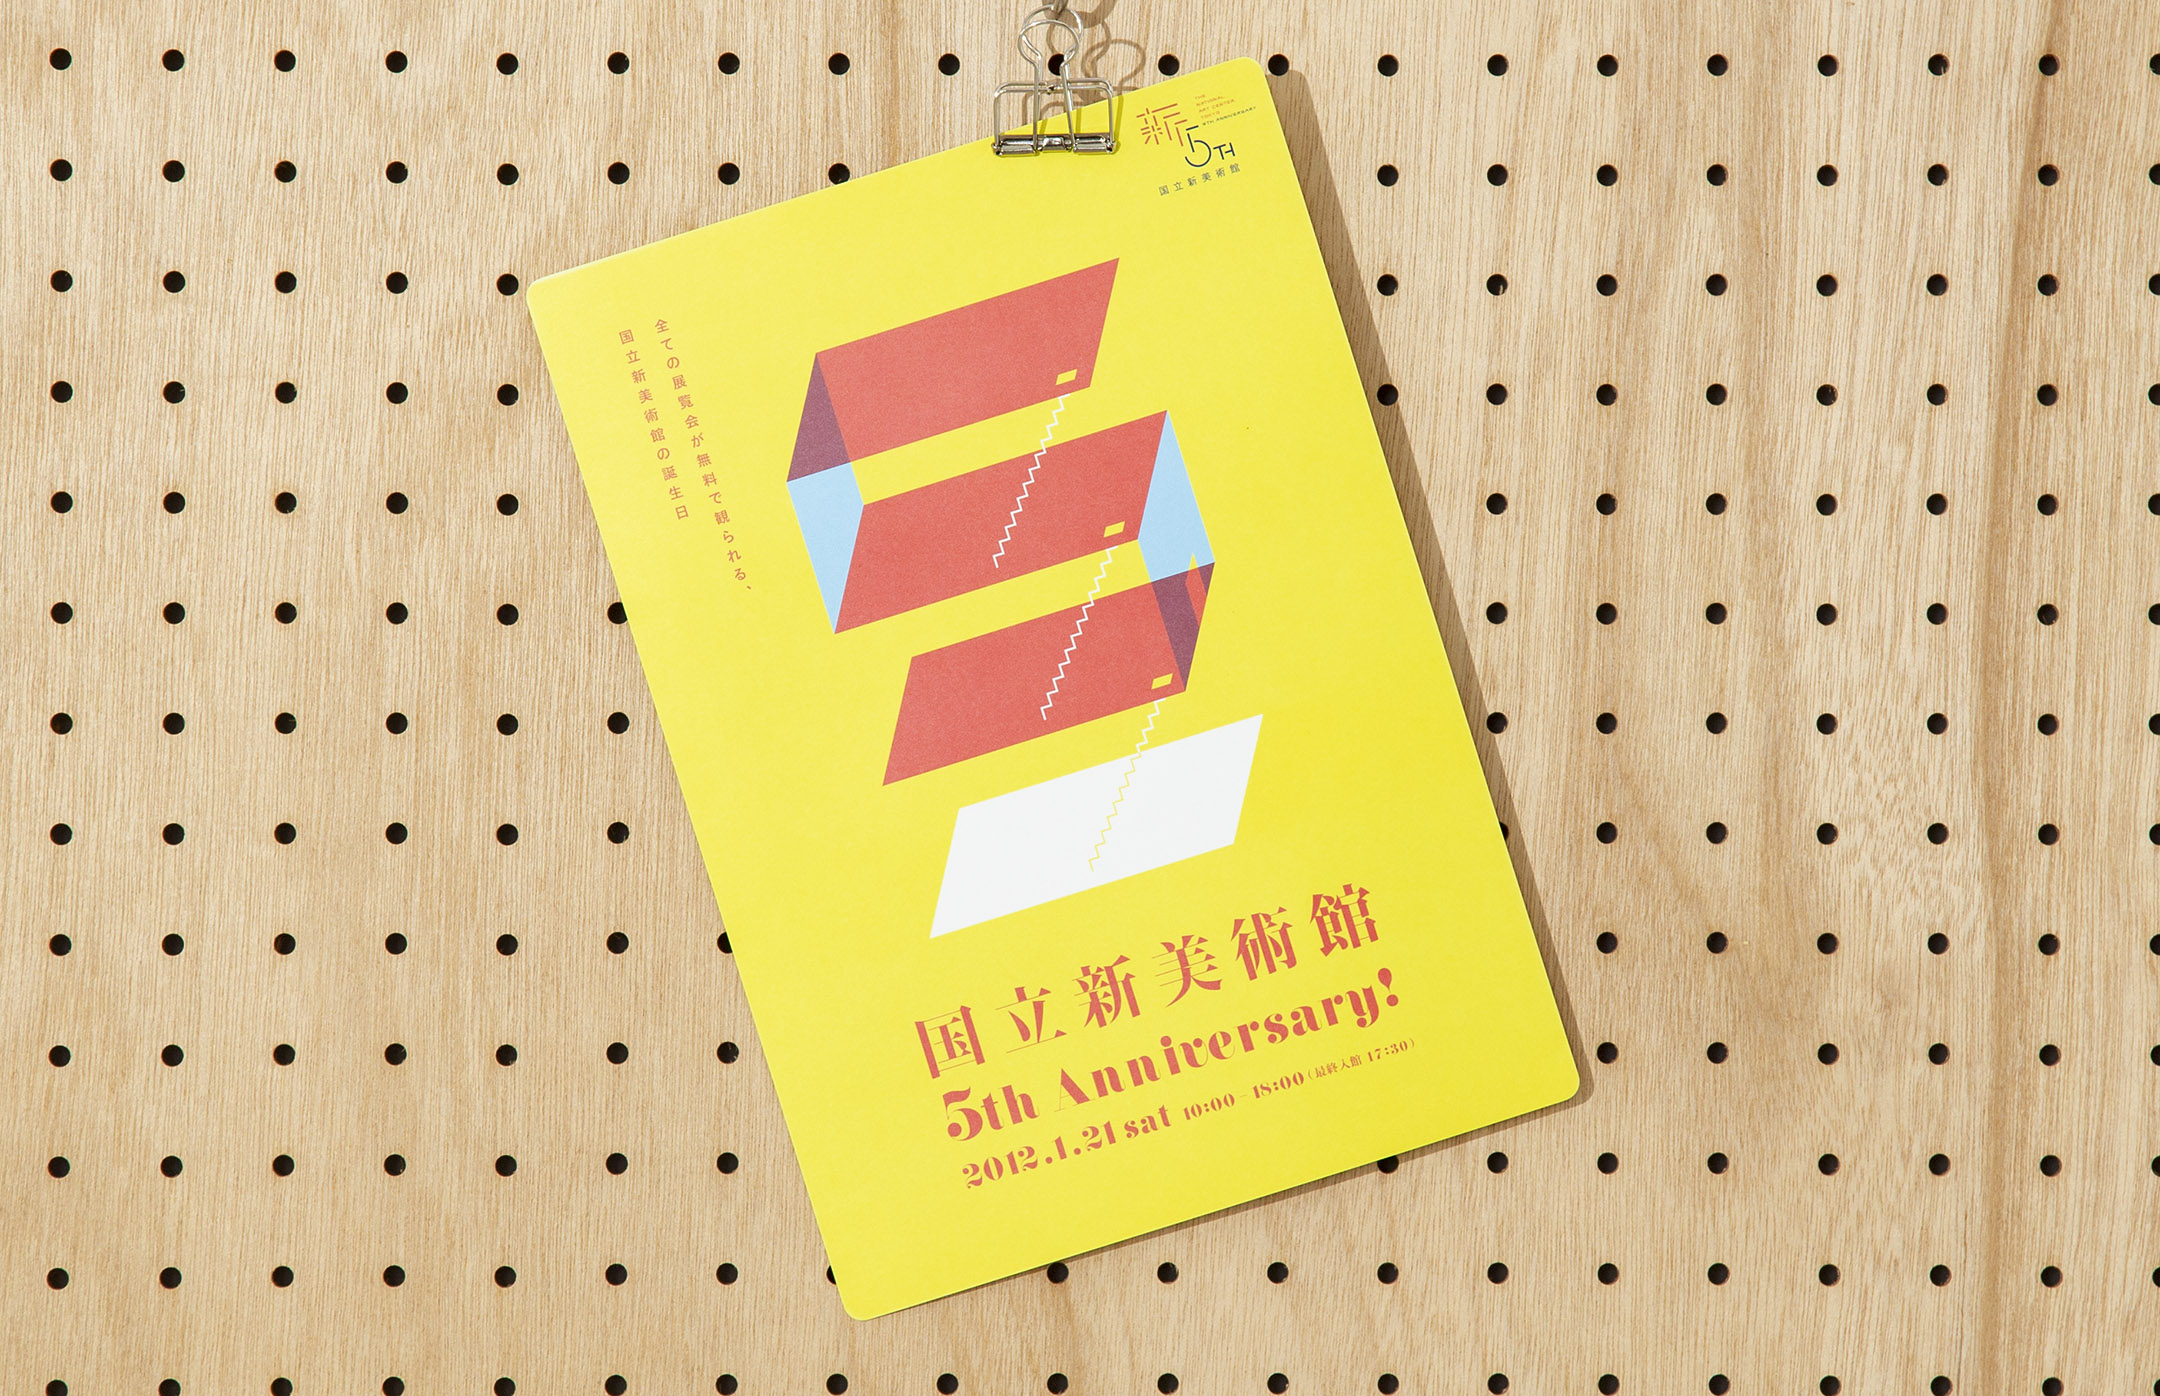 国立新美術館 5th Anniversary